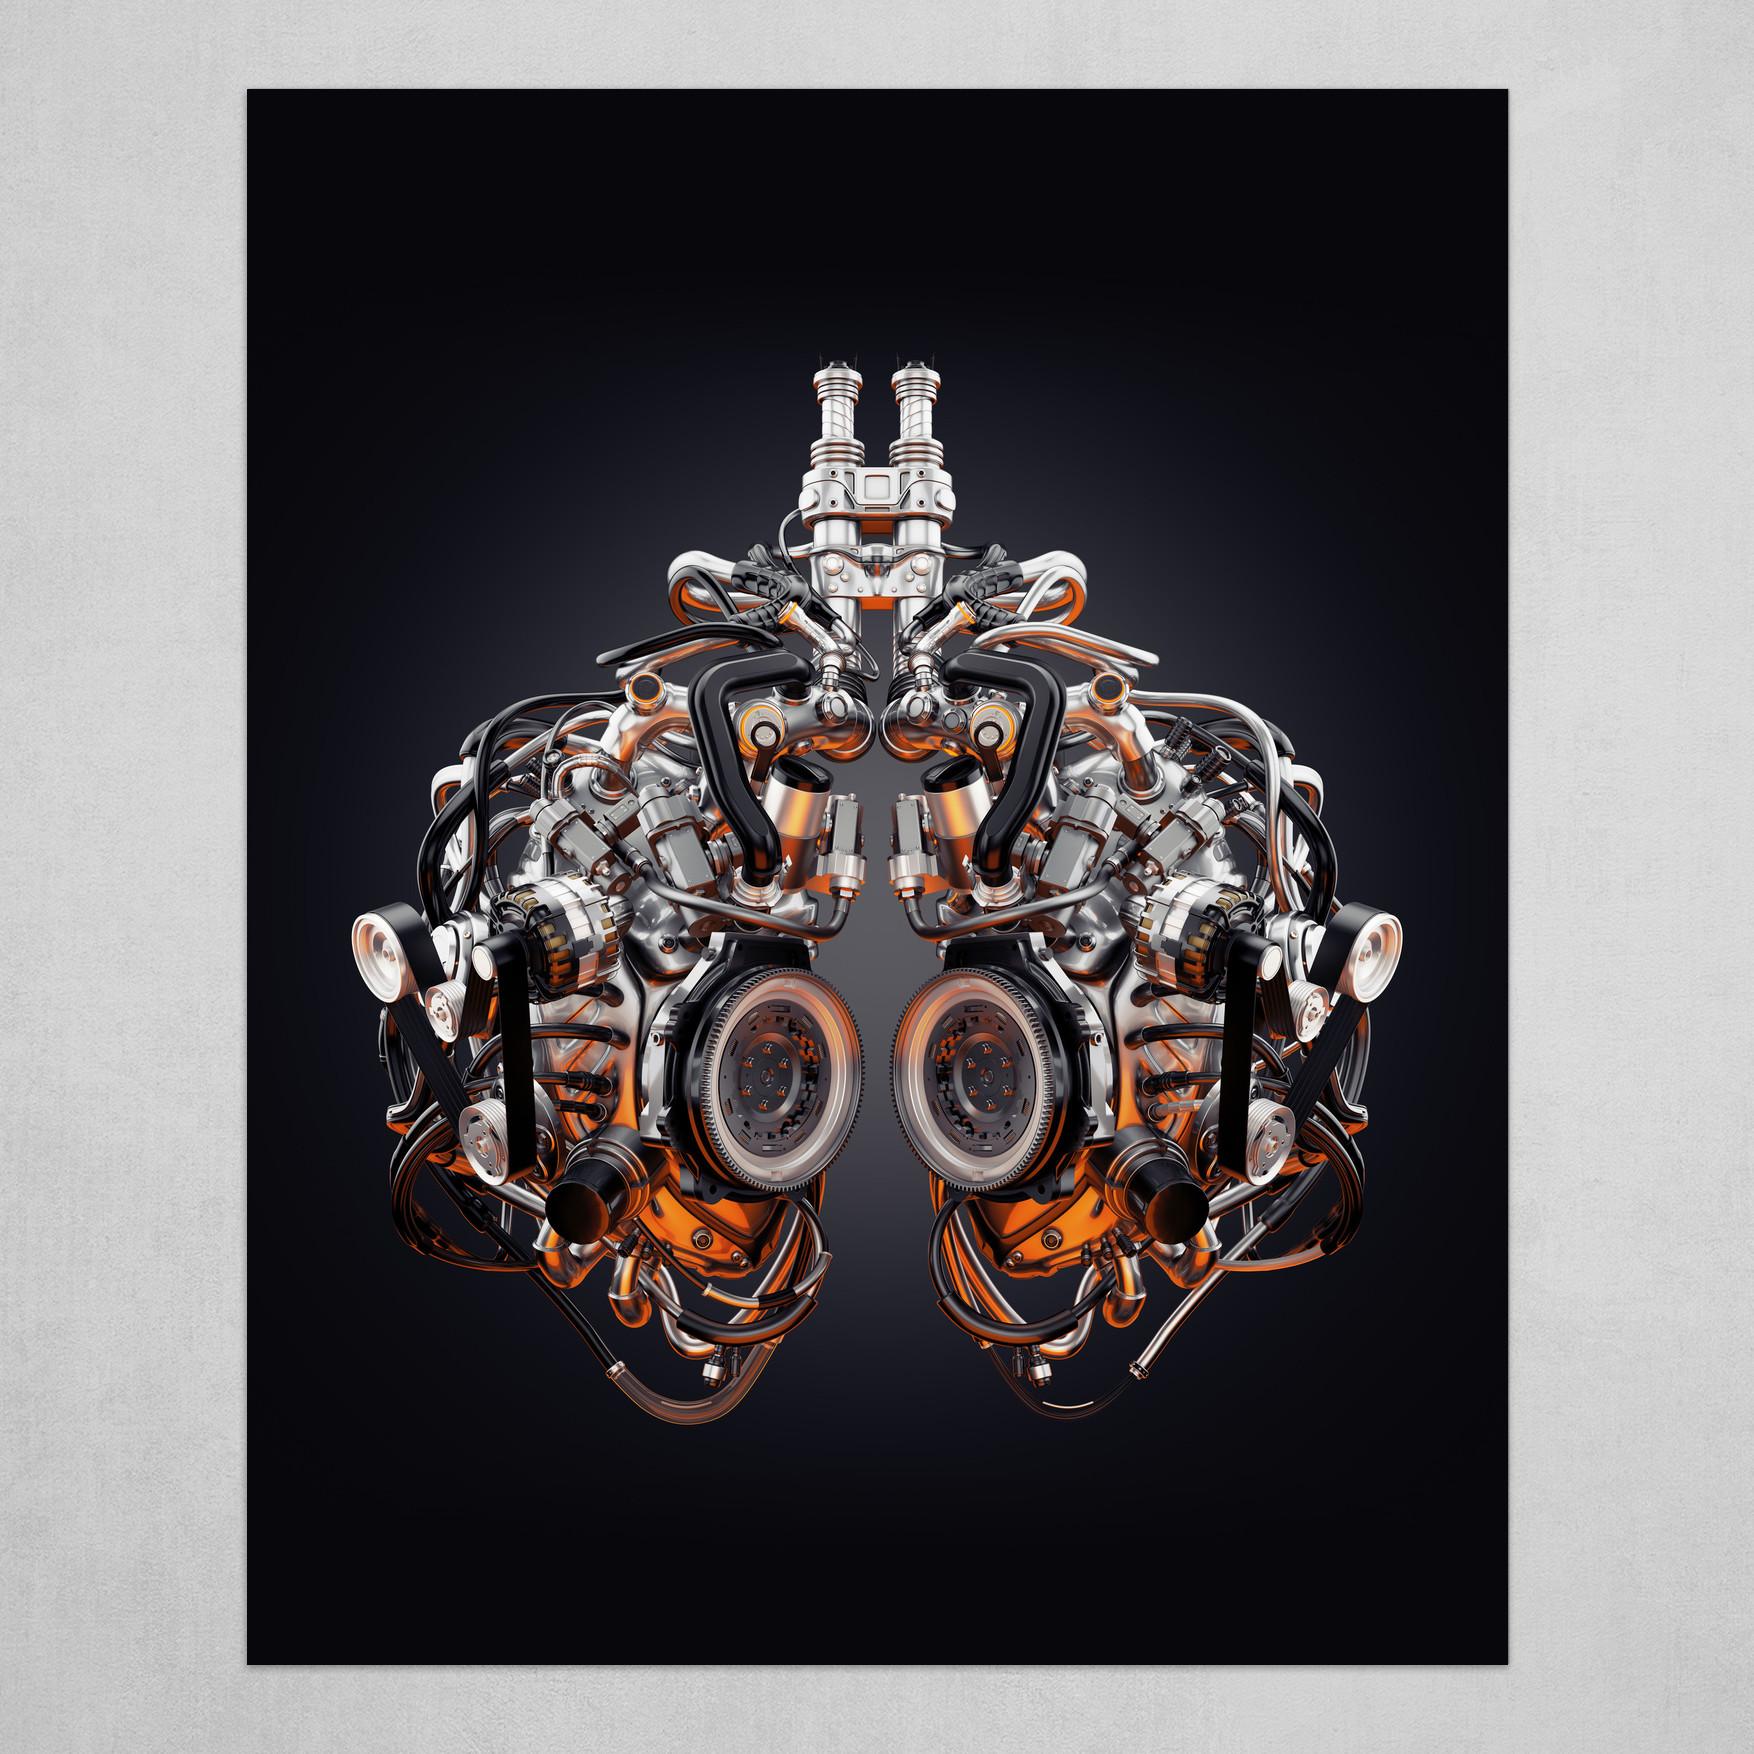 Steel robotic lungs